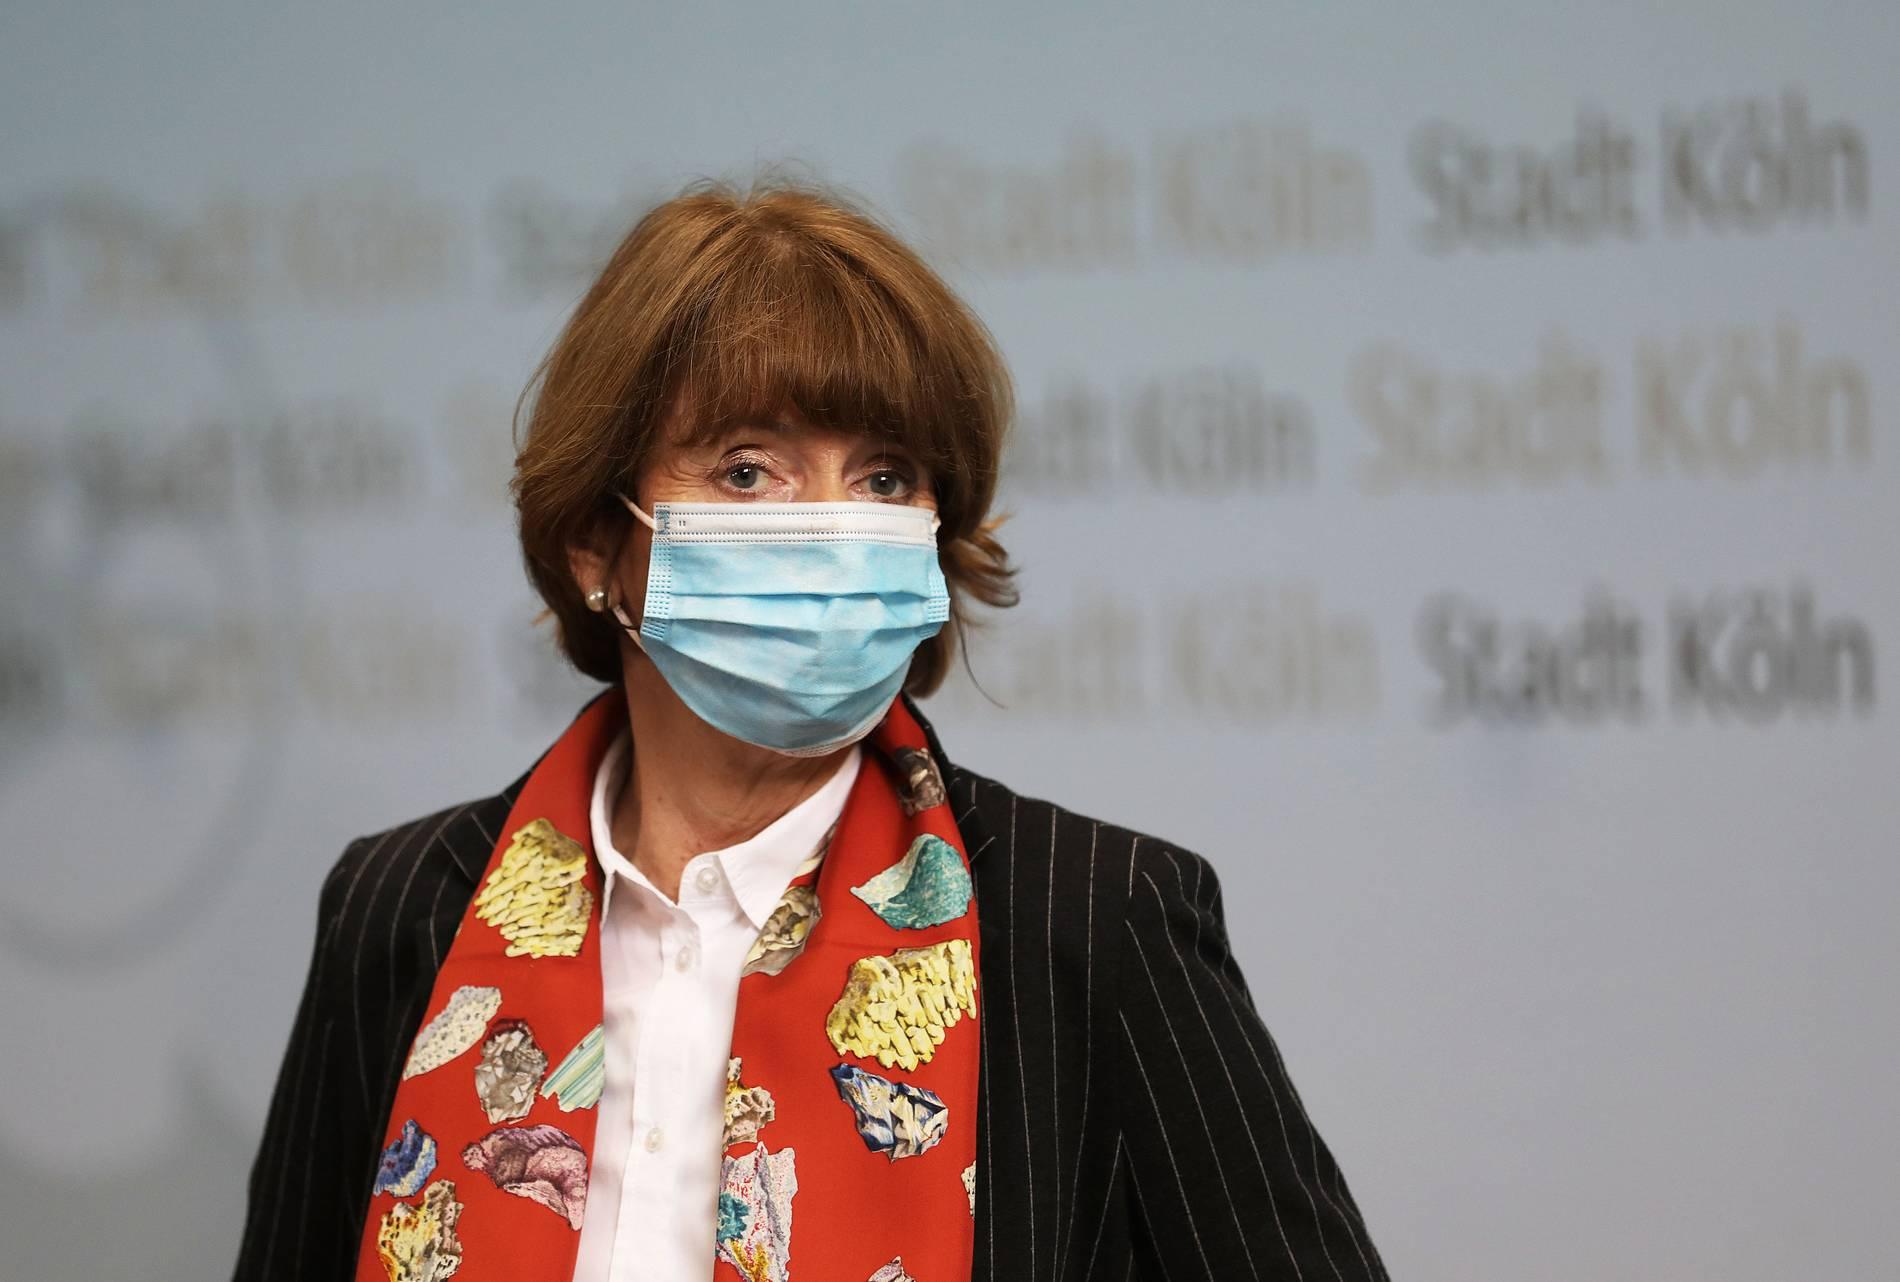 Oper in Köln: Neuer Intendant Hein Mulders soll Opernstadt